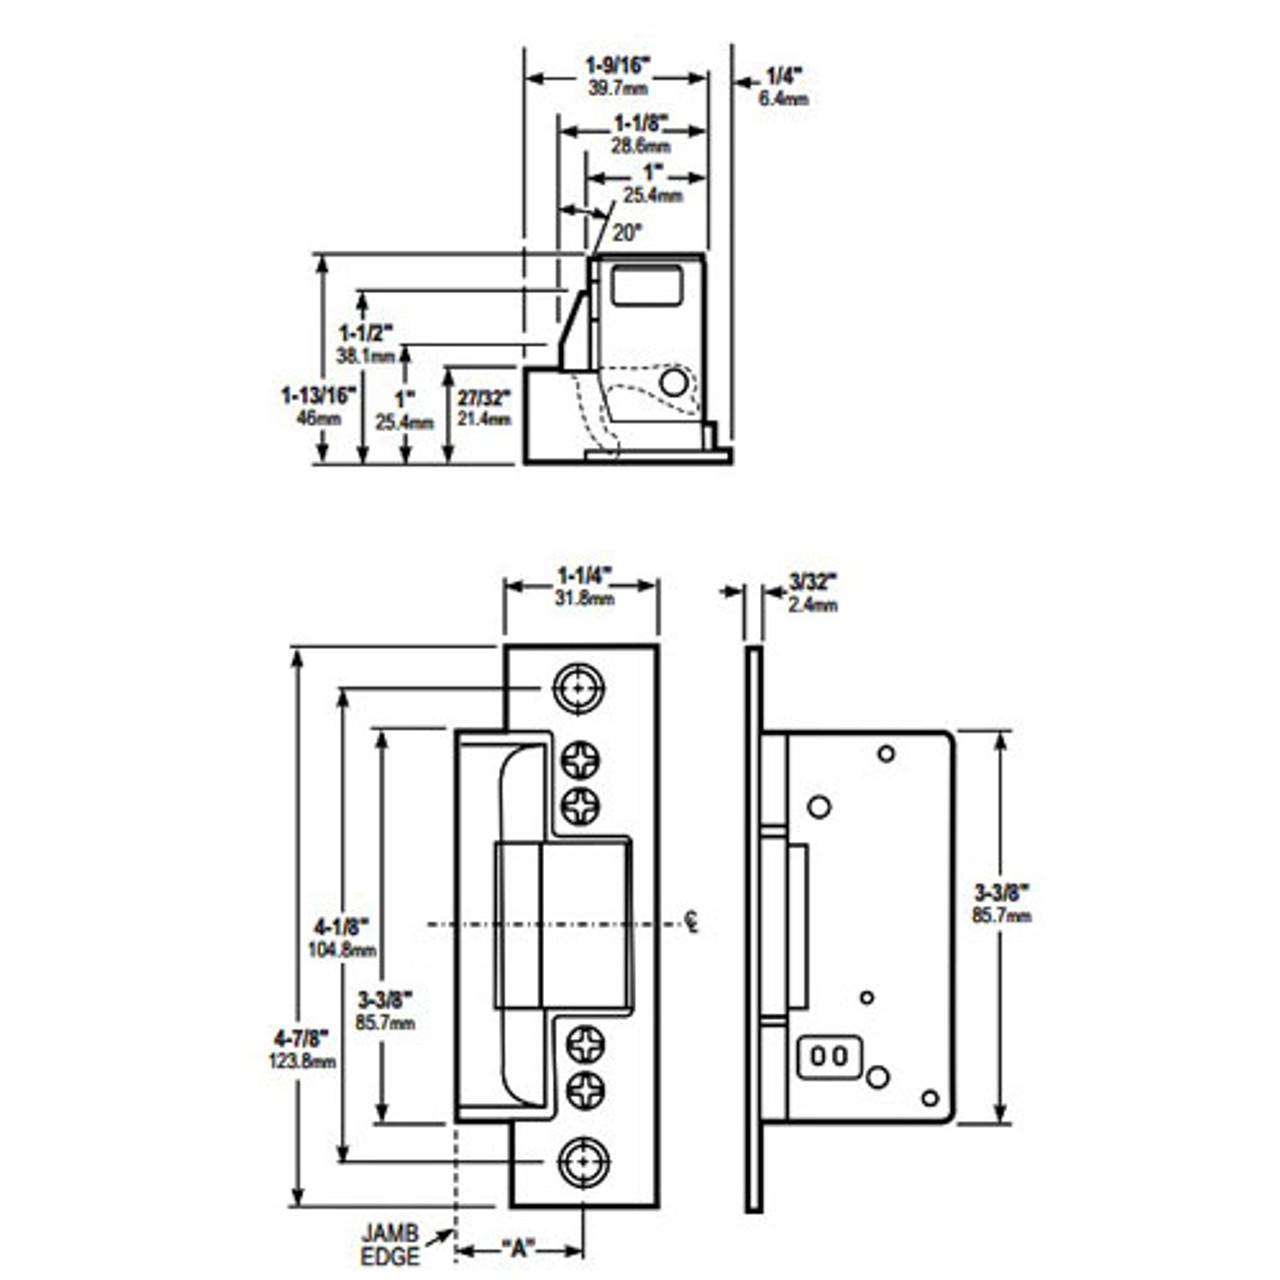 7170-319-628 Adams Rite Electric Strike Dimensional View